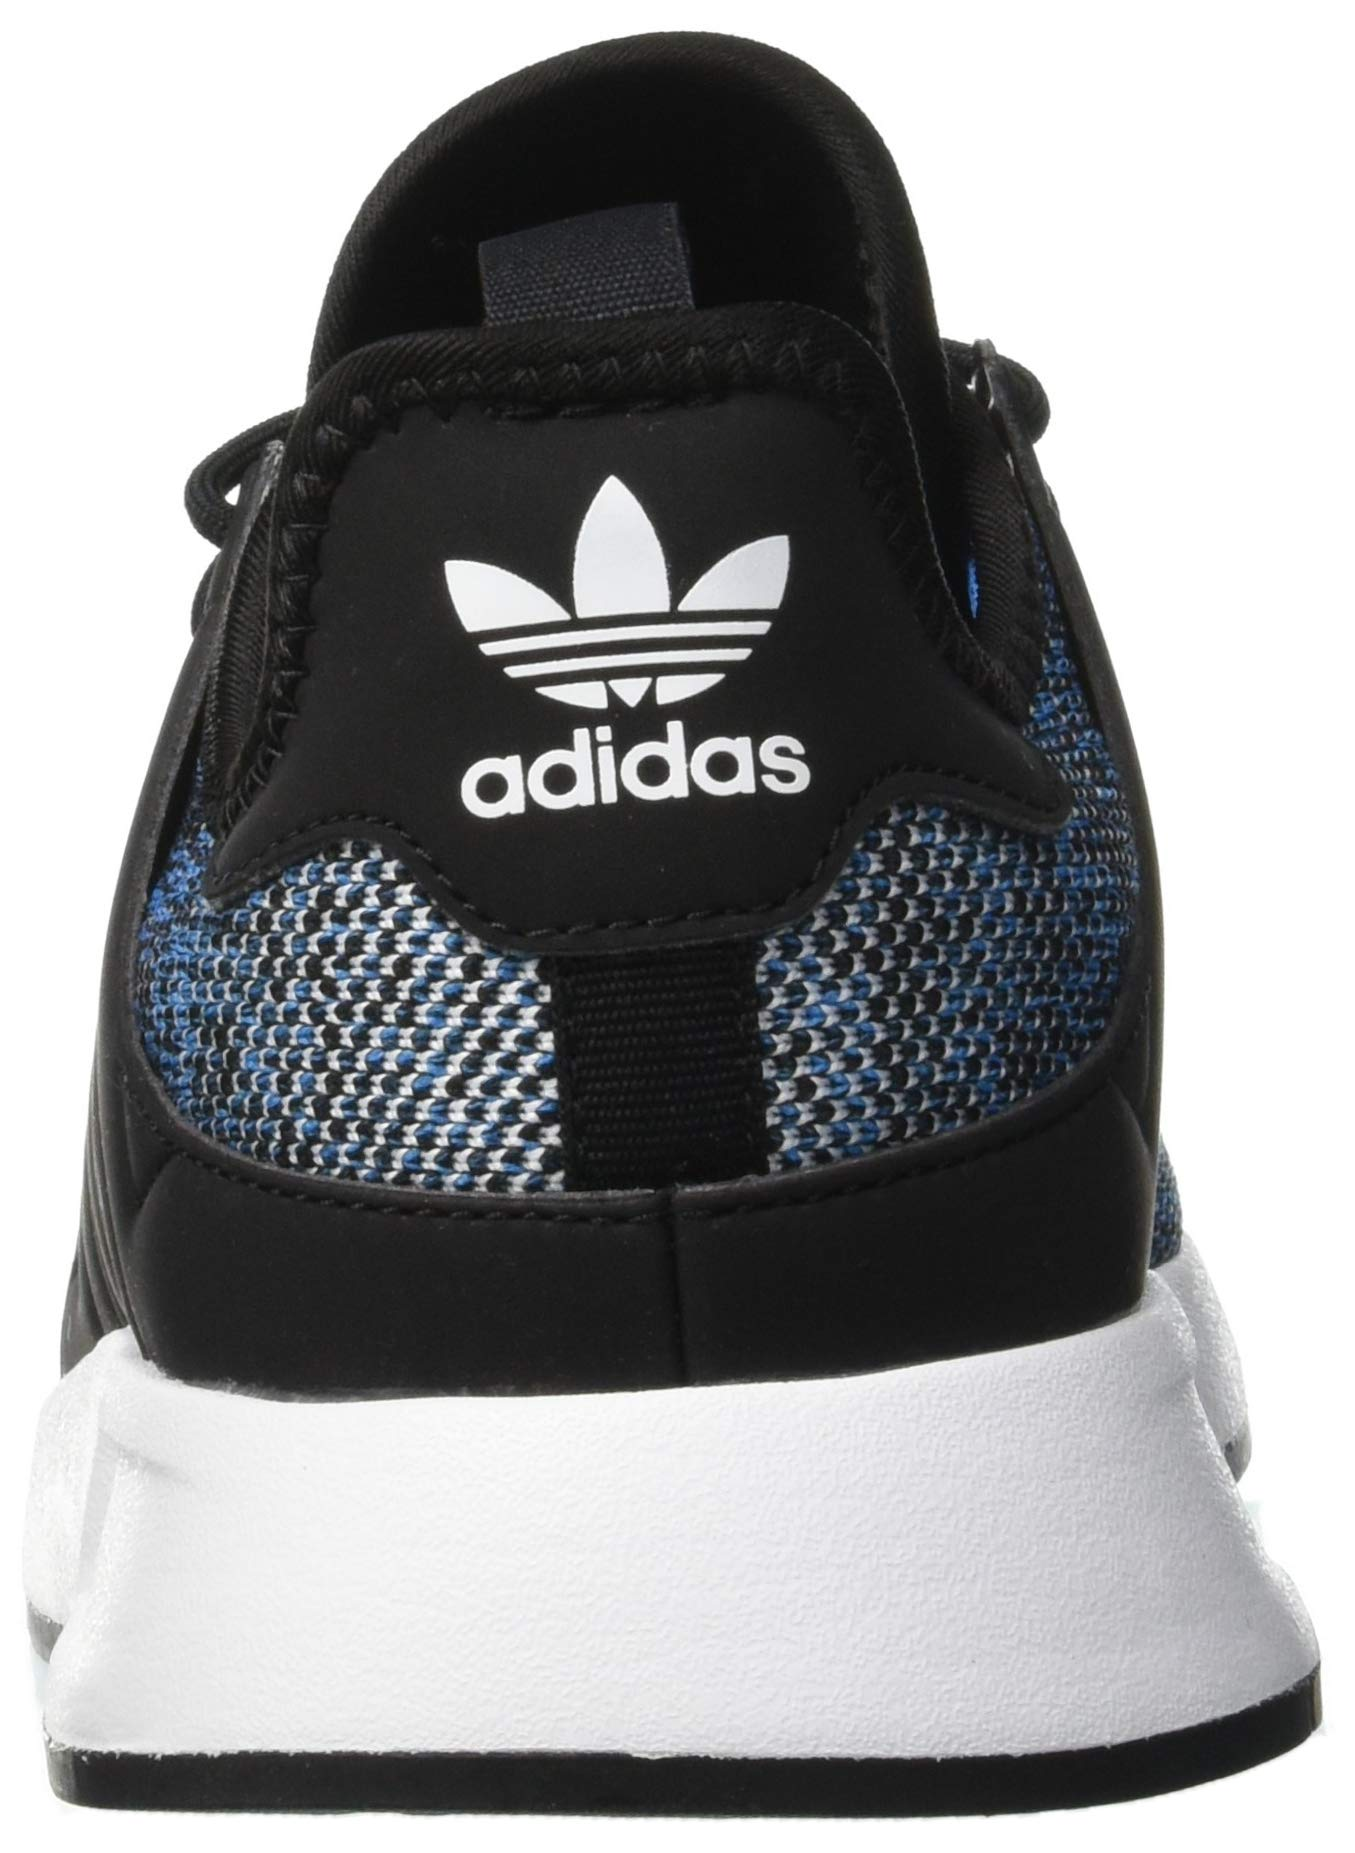 adidas X_PLR J, Scarpe da Fitness Unisex – Bambini 2 spesavip